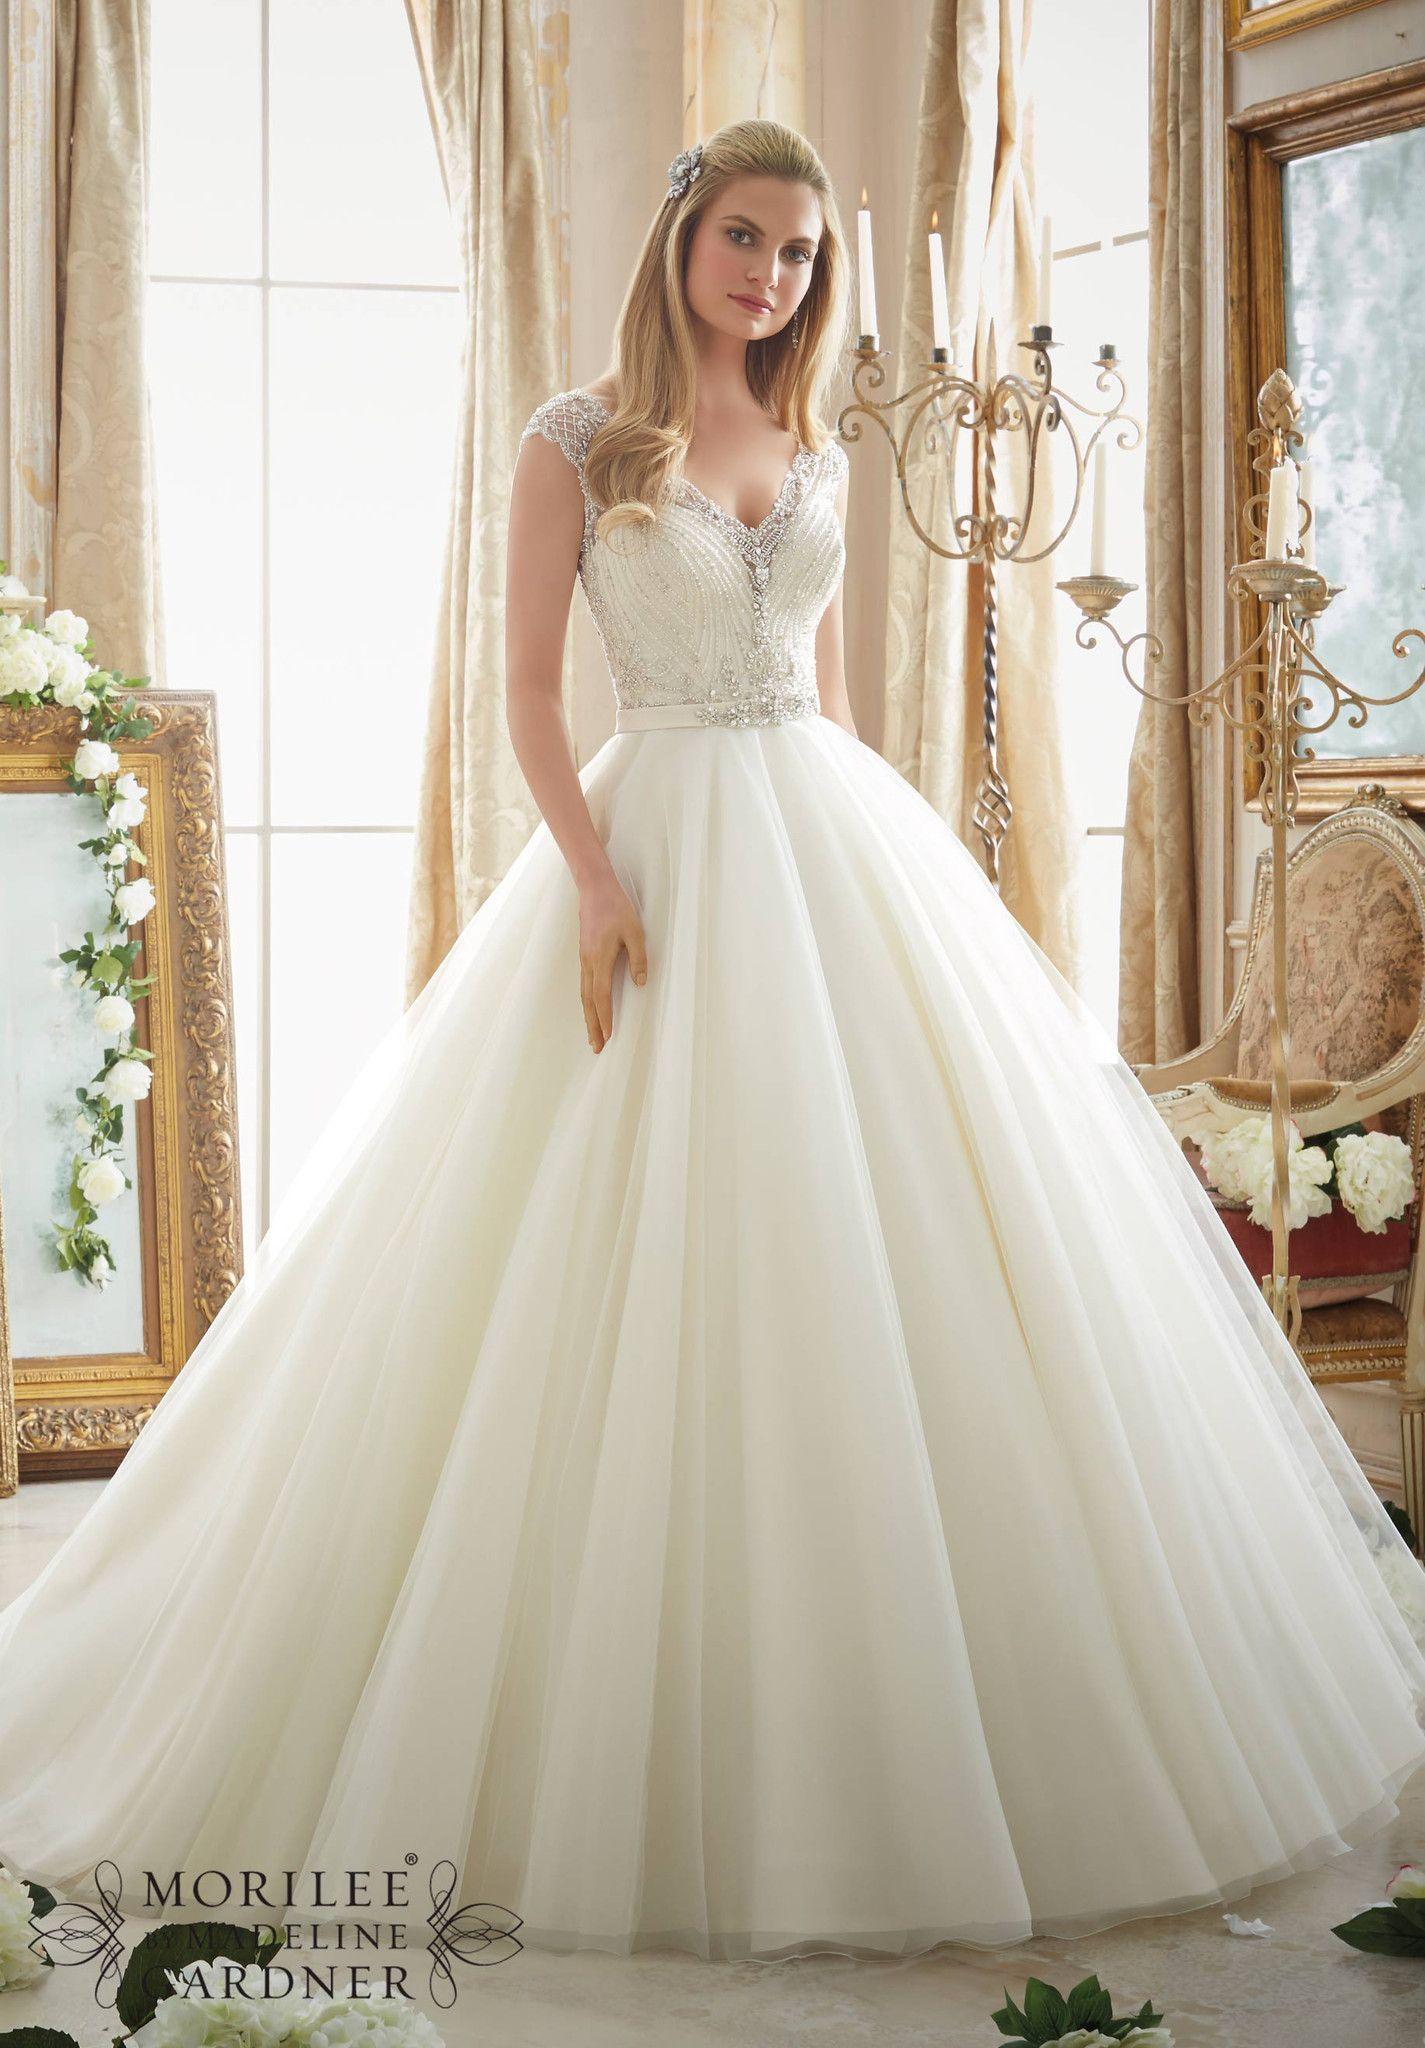 Mori Lee - 2875 - All Dressed Up, Bridal Gown | Mori lee, Bridal ...